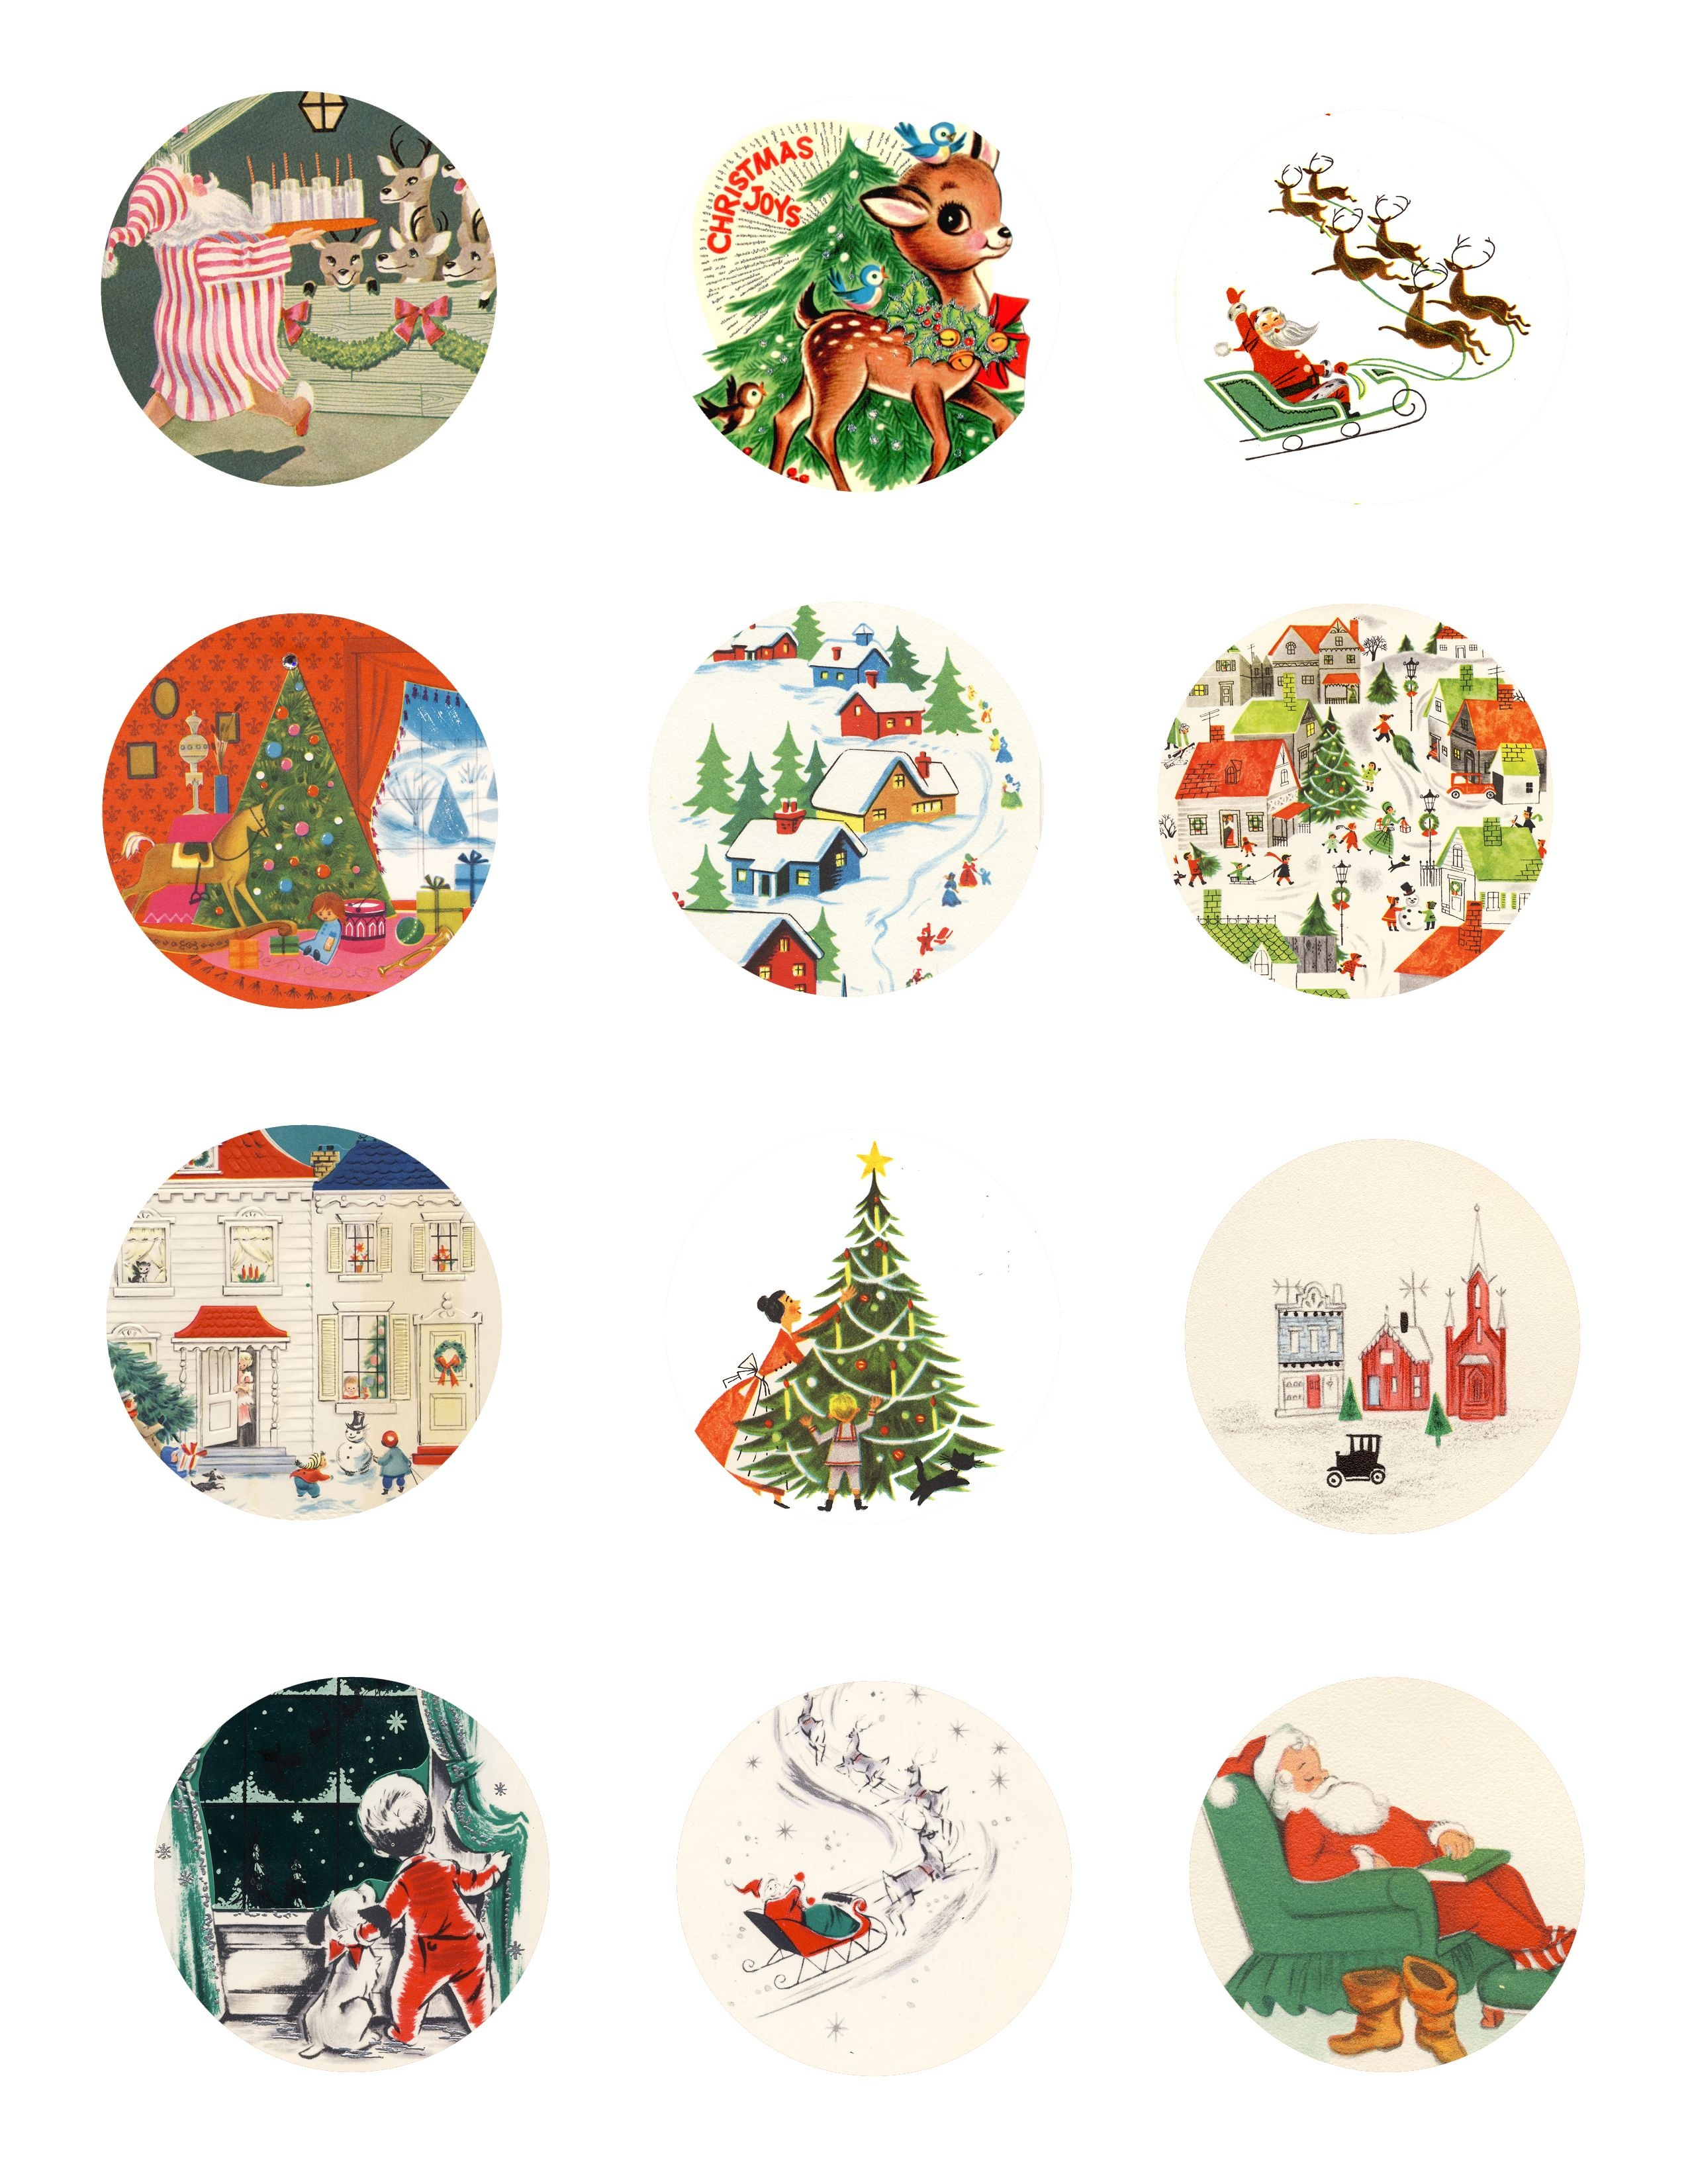 Free Vintage Tags |  Tags Page 1 791X1024 Free Printable Vintage - Free Printable Vintage Christmas Tags For Gifts